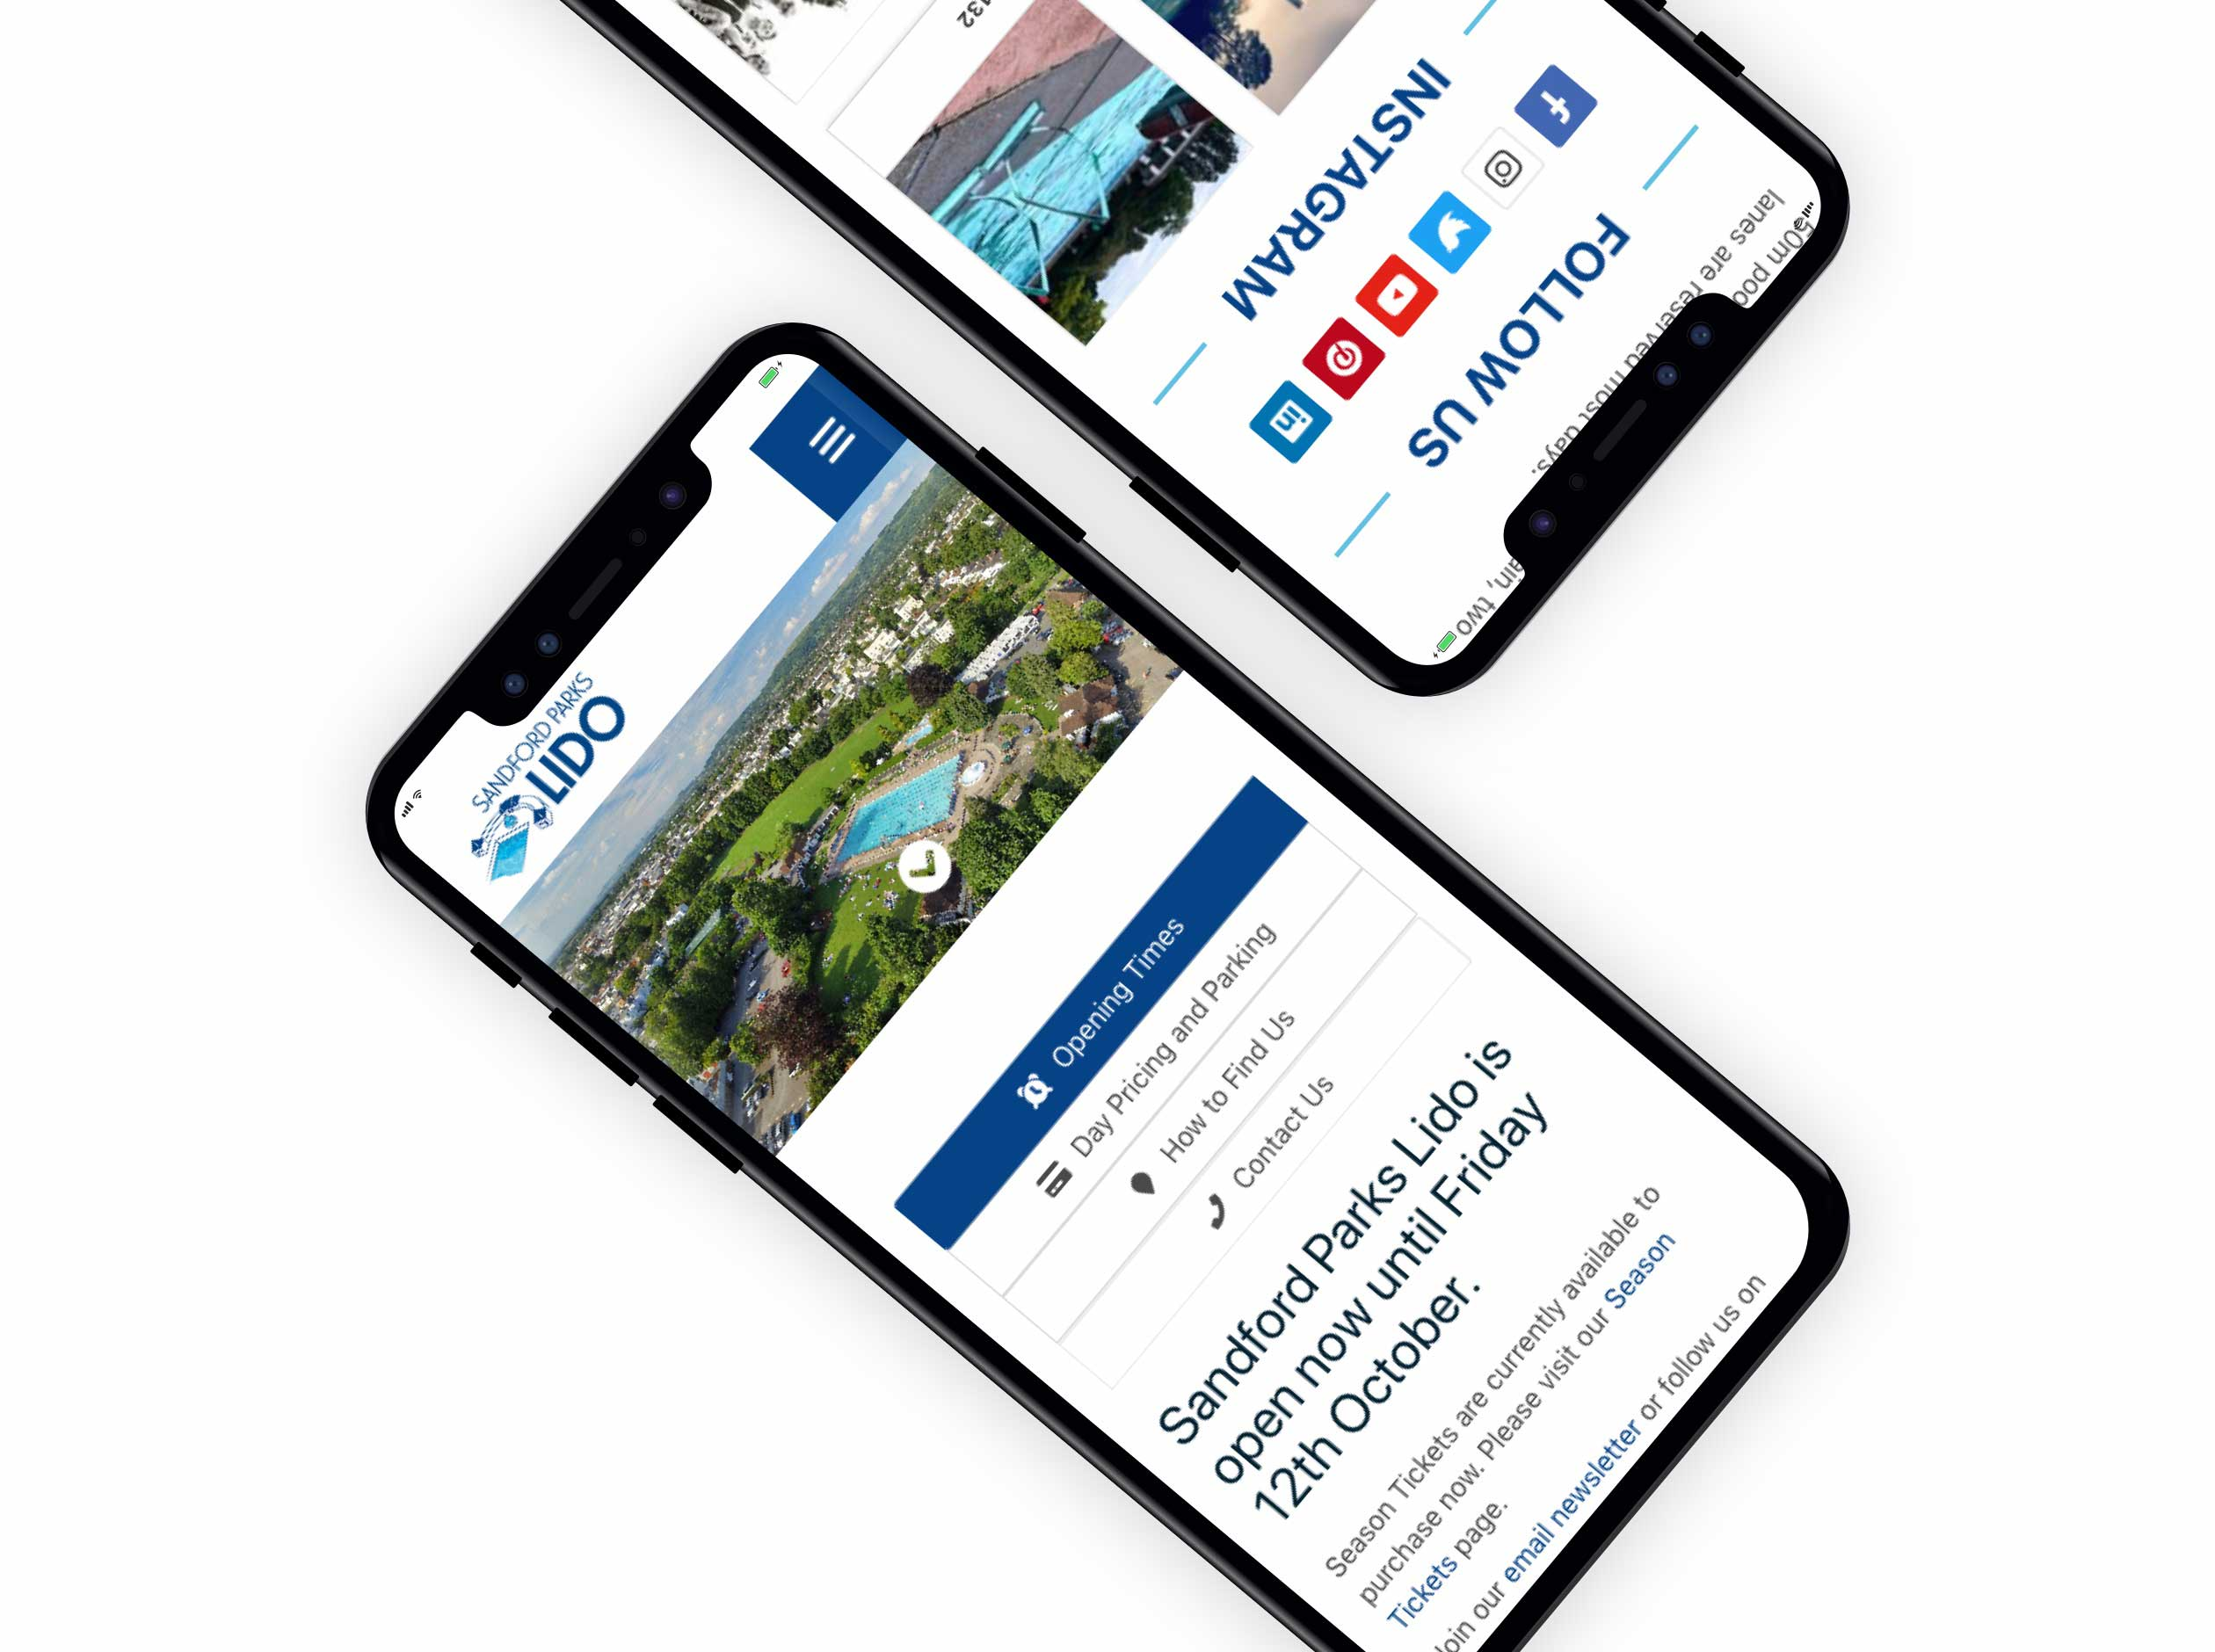 Sandford Parks Lido website in mobile view